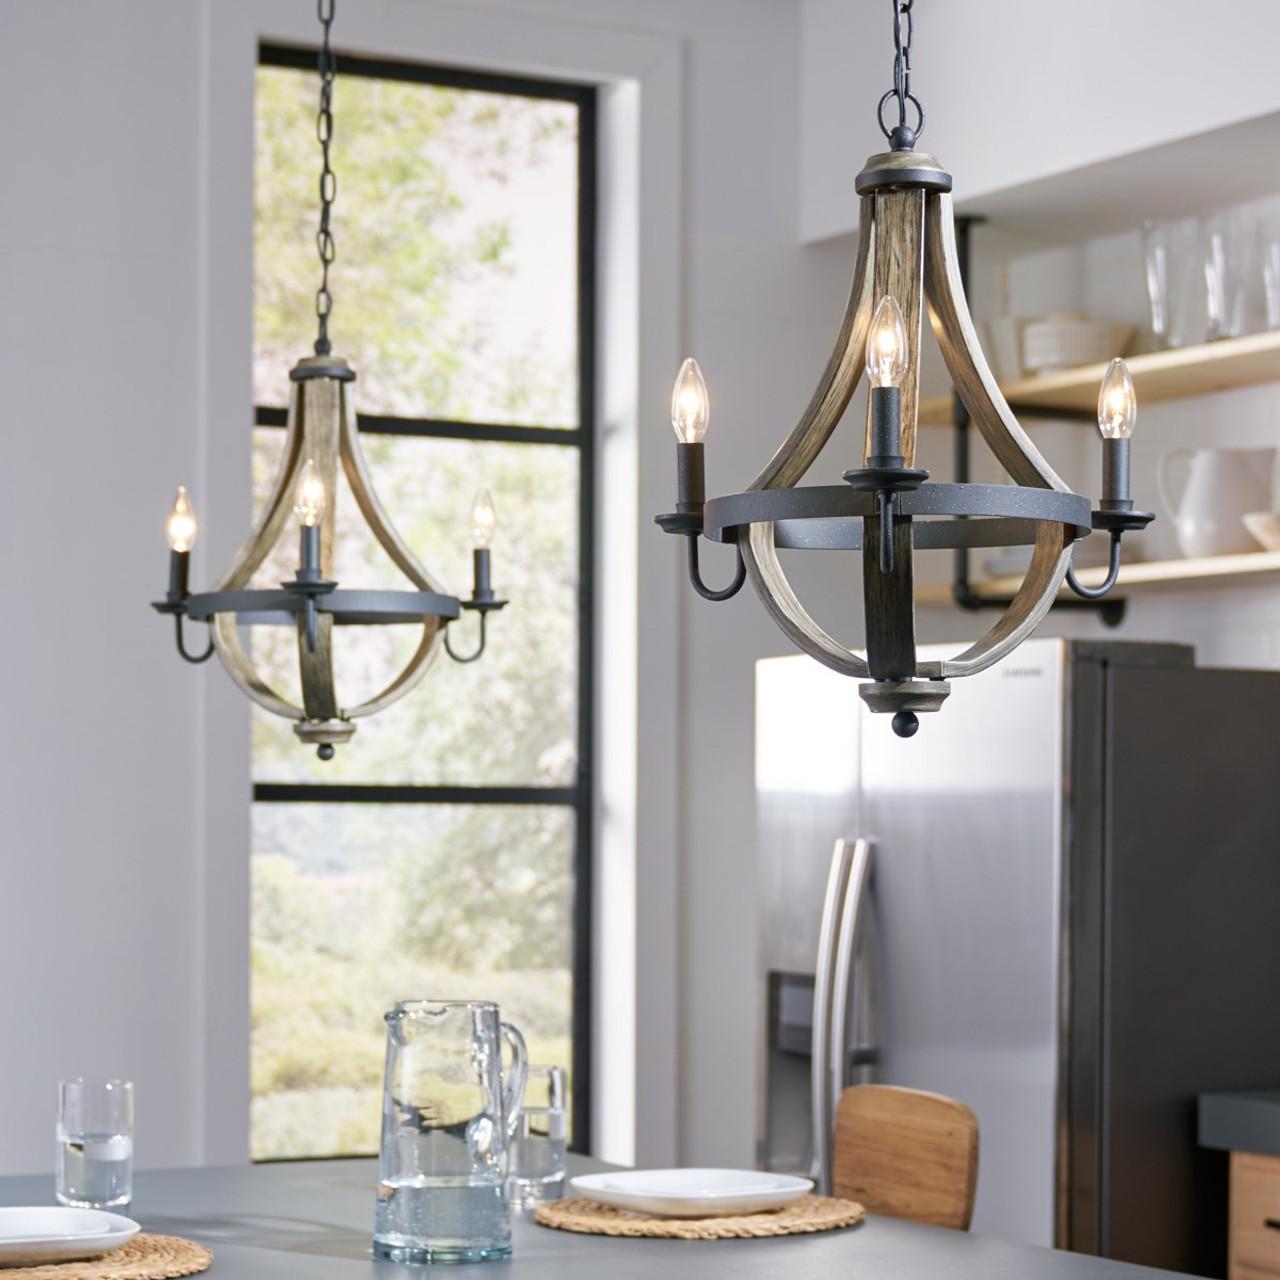 merlot 20 3 light distressed black wood finish chandelier by kichler lighting